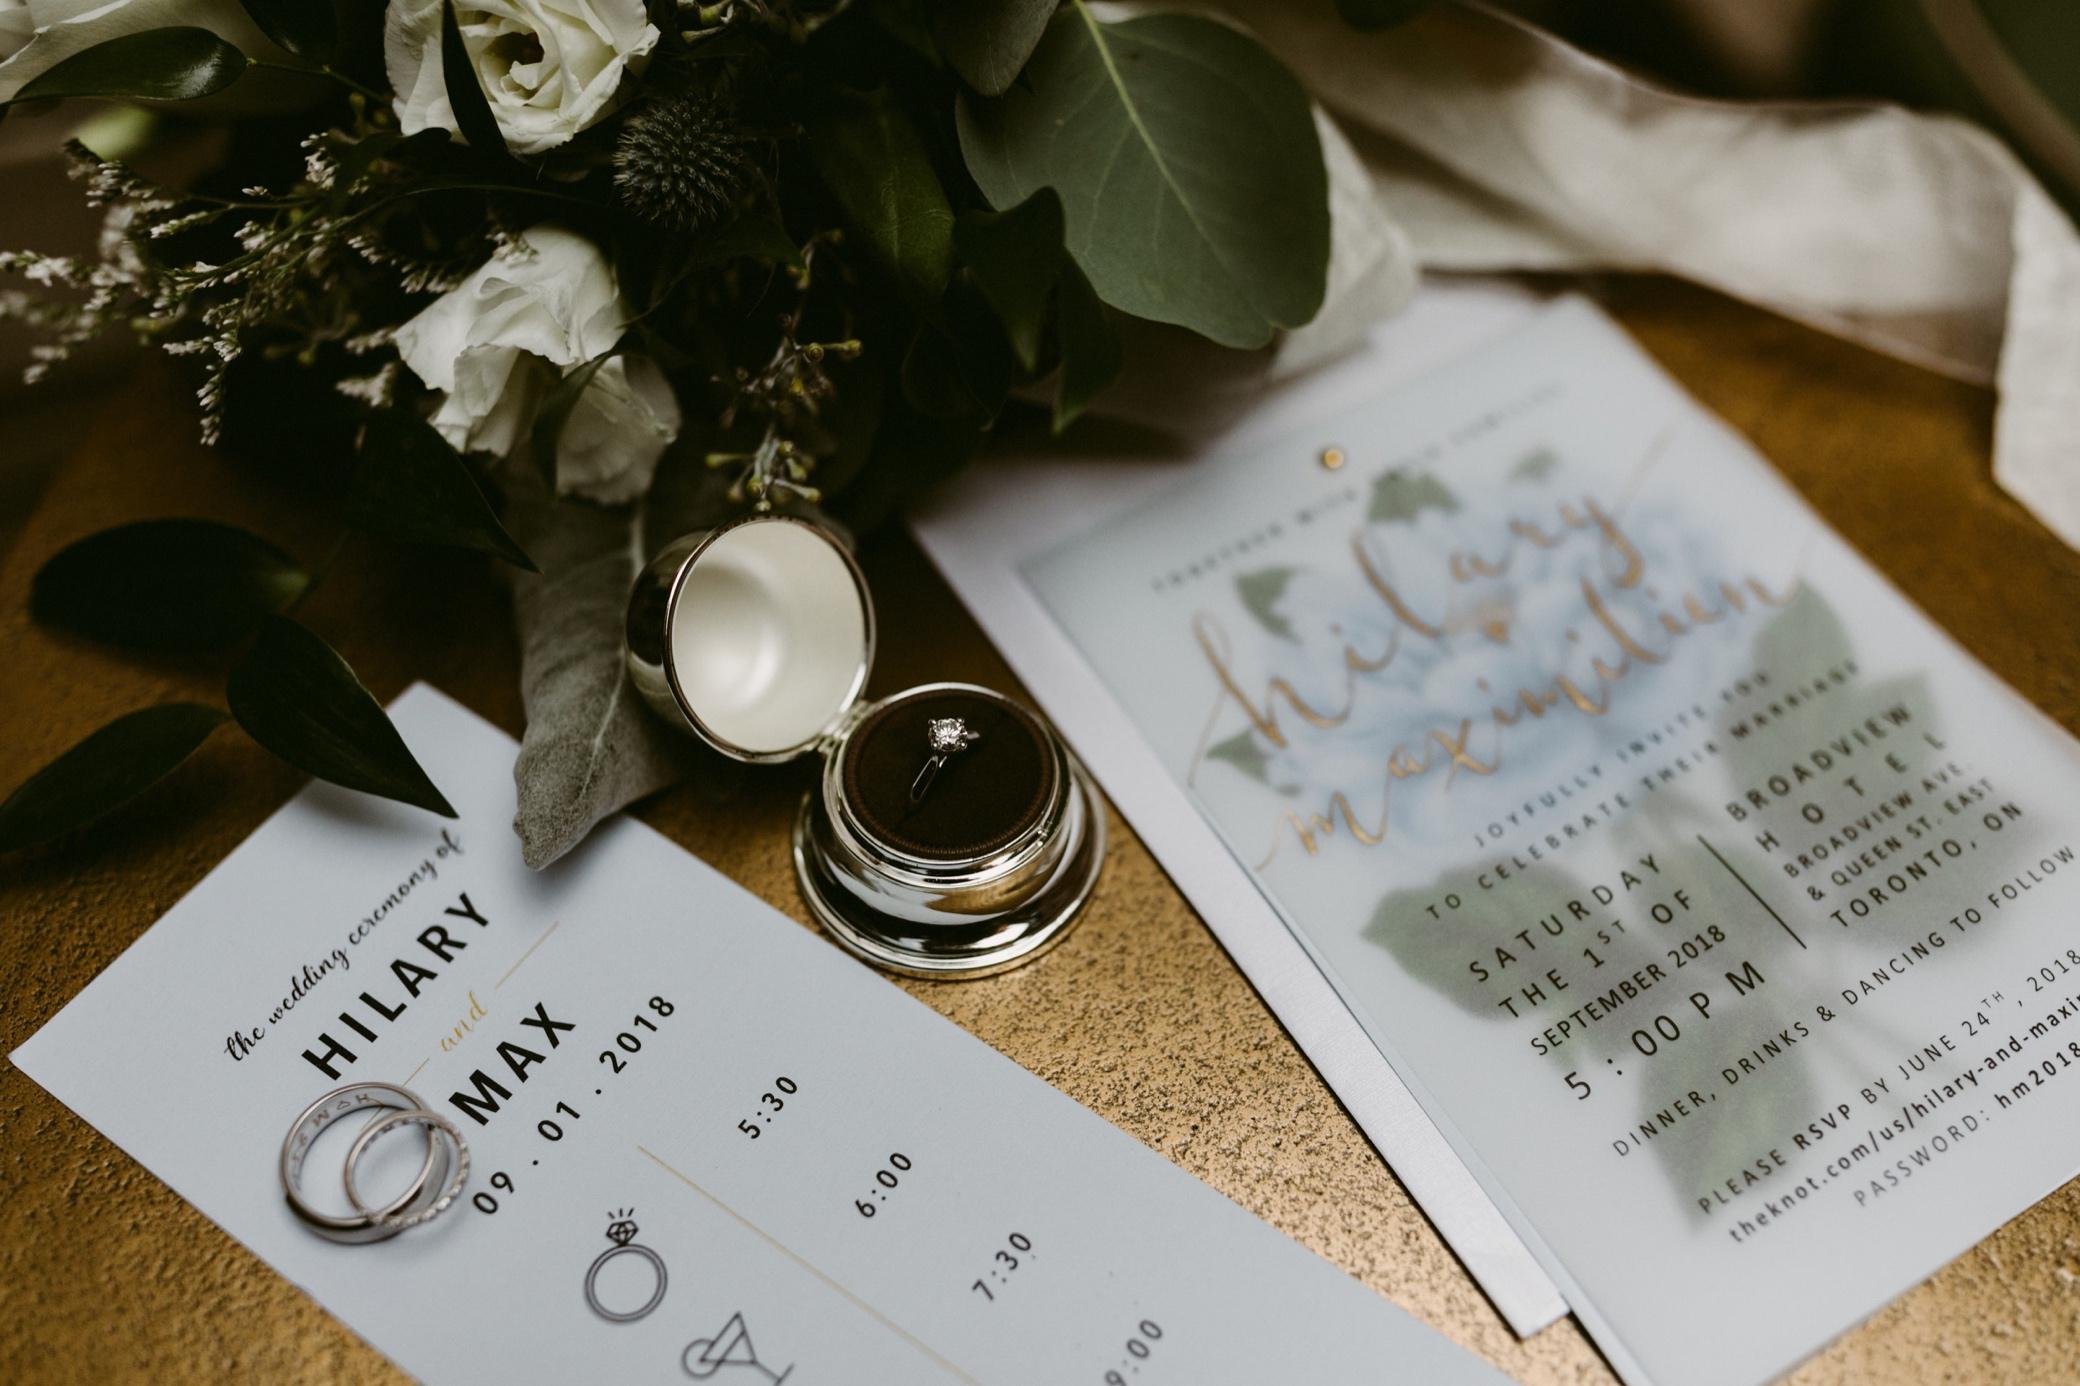 006_The Broadview Hotel Wedding (89 of 913).jpg